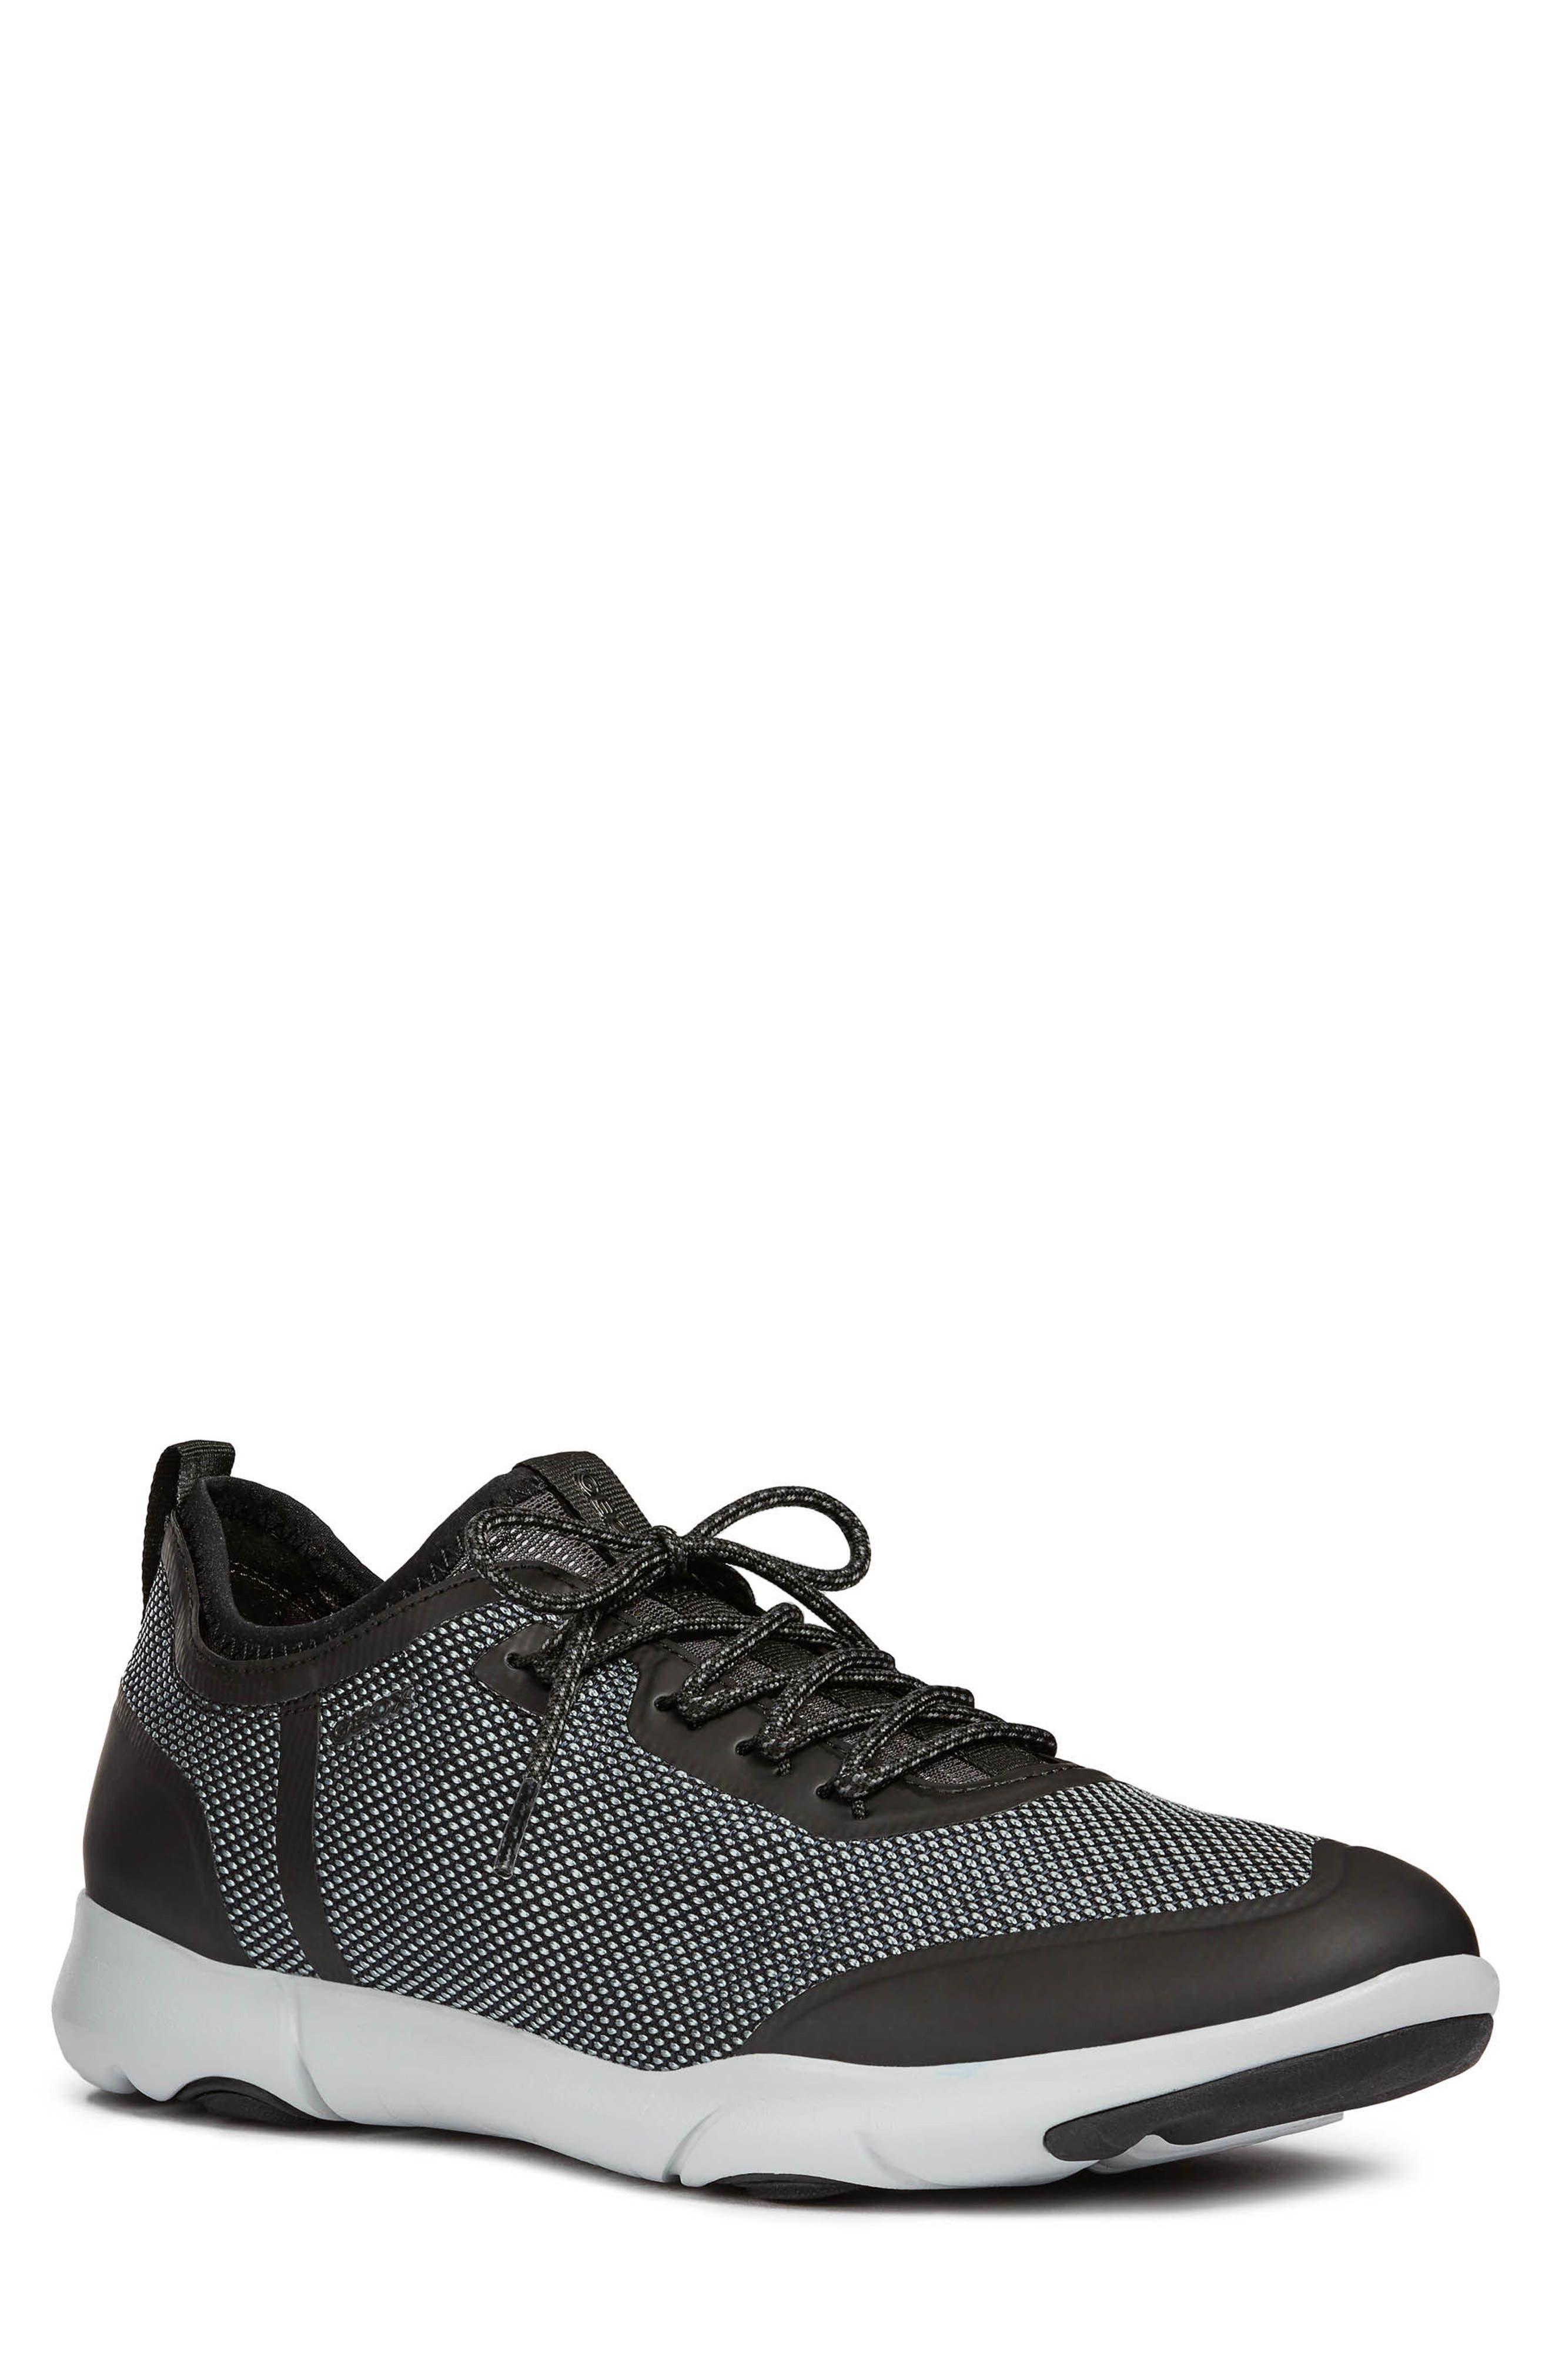 Nebula X 3 Low Top Sneaker,                             Main thumbnail 1, color,                             BLACK LEATHER